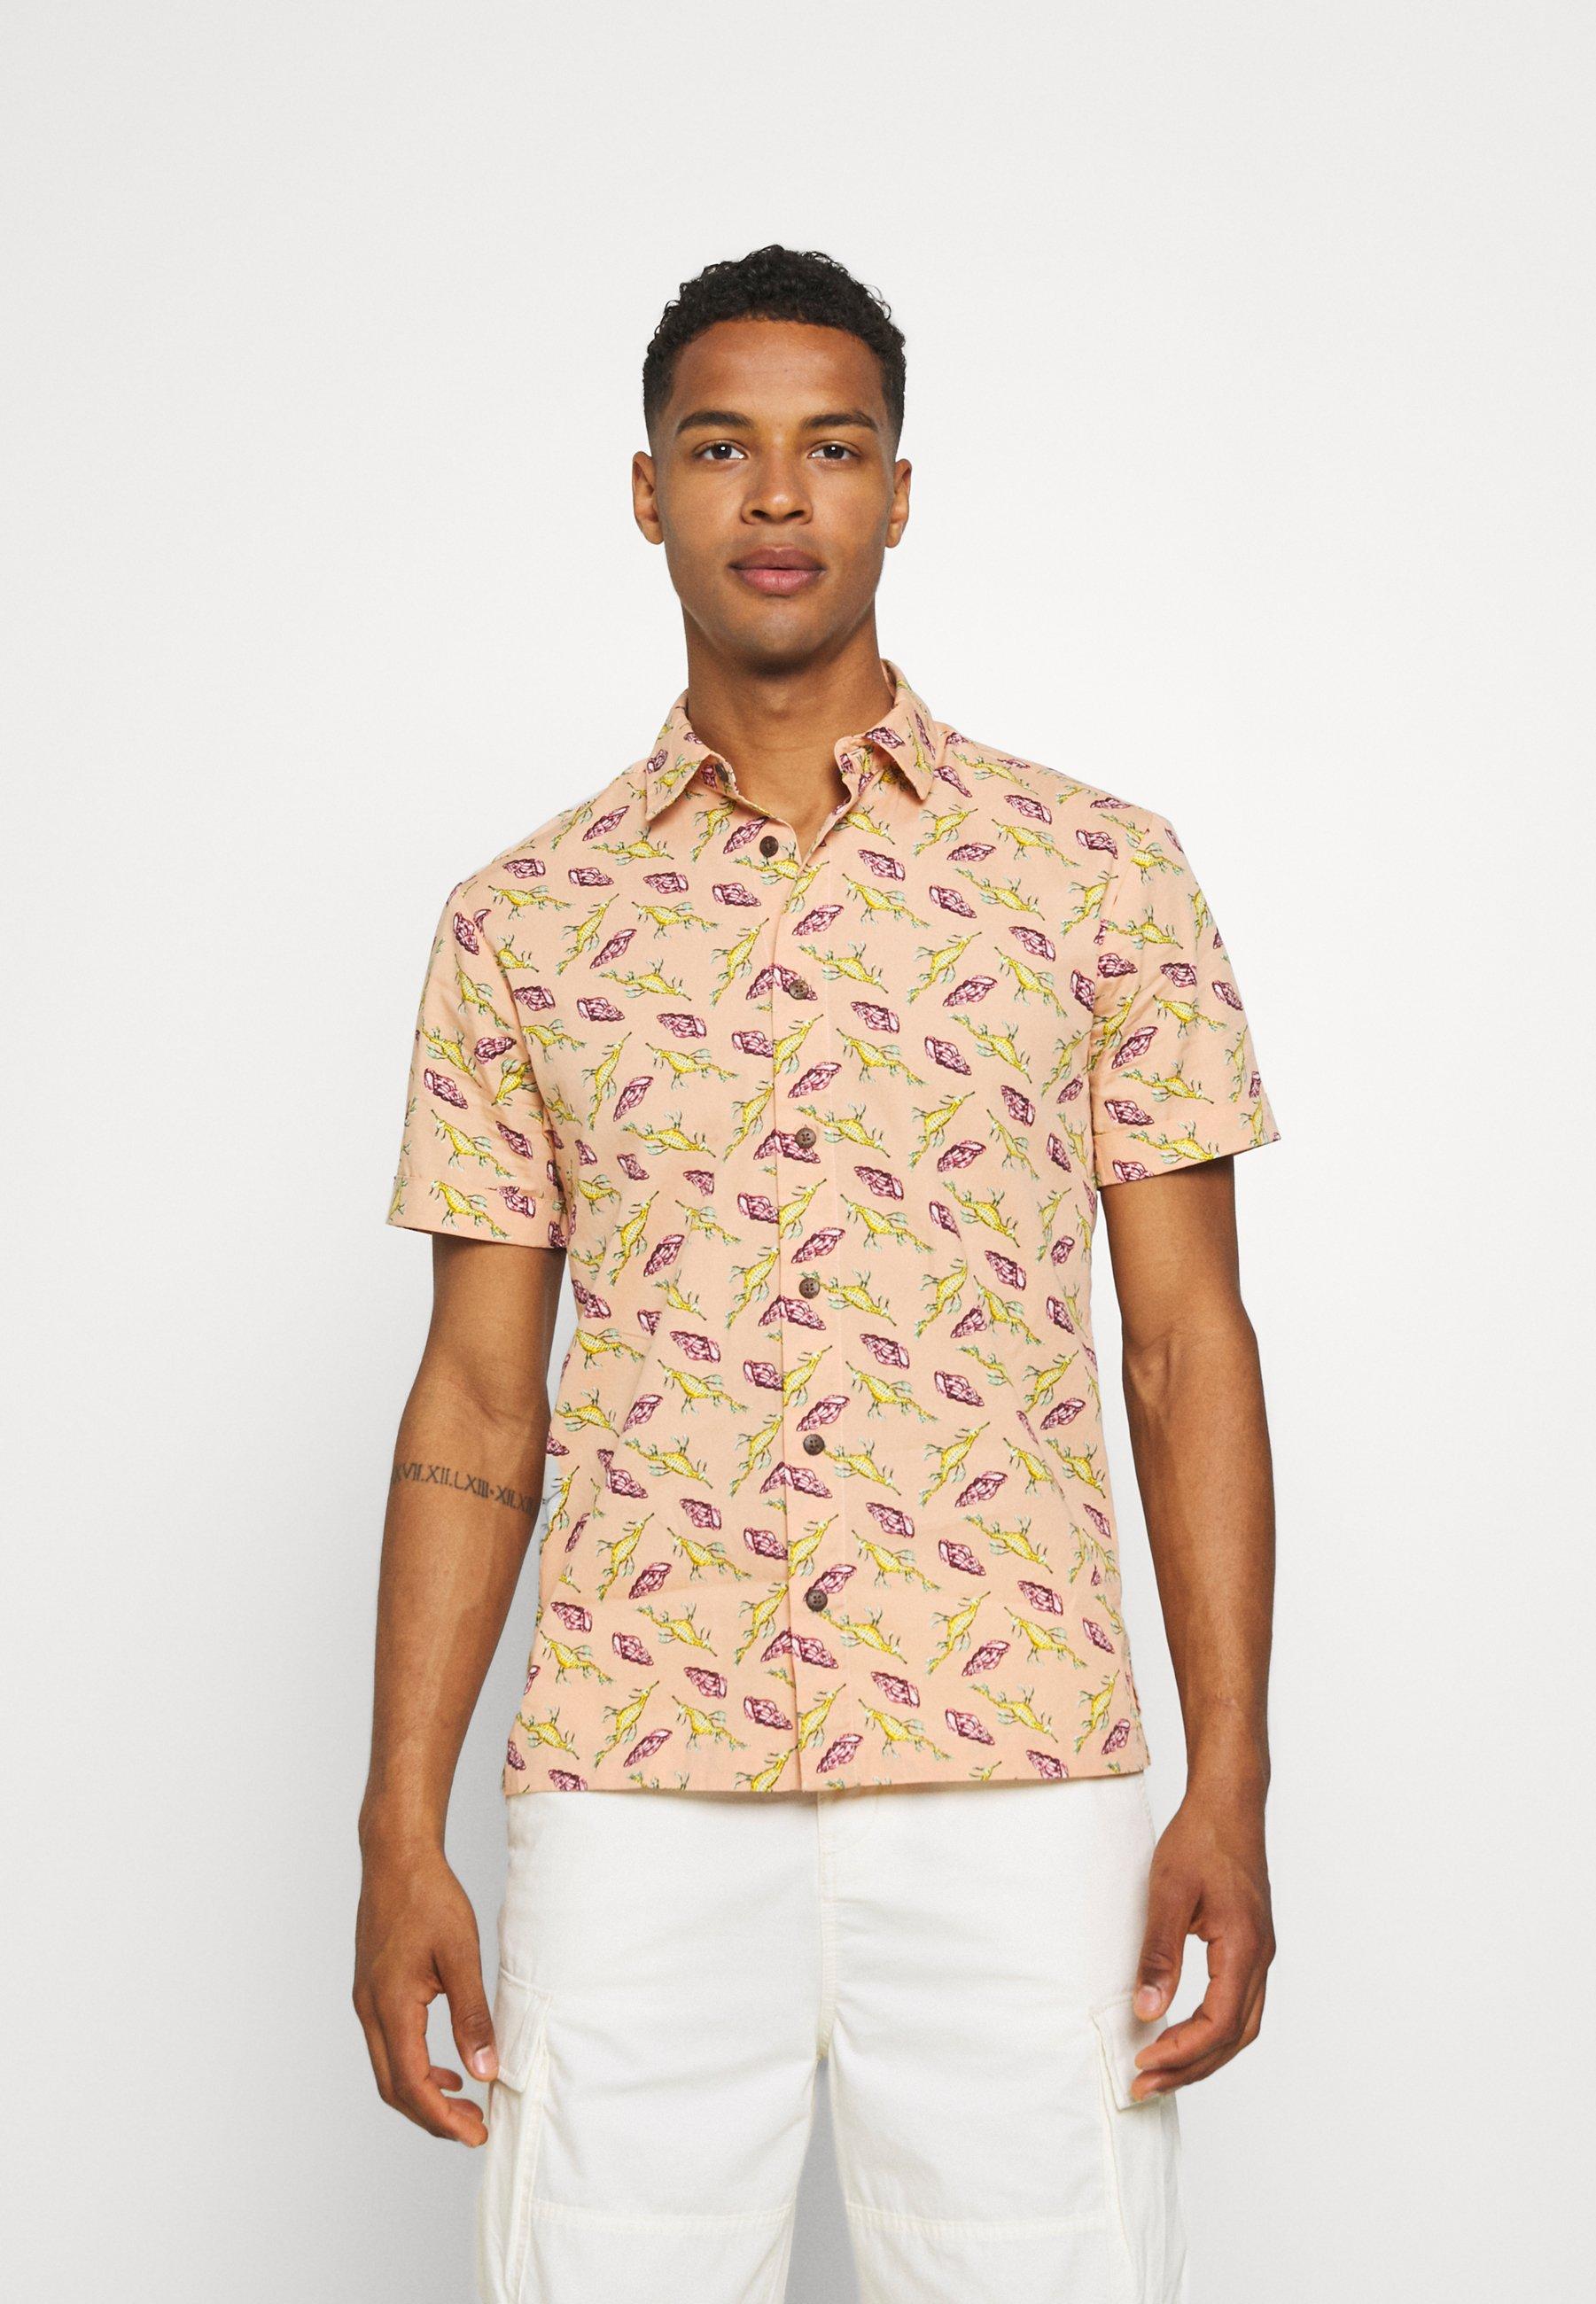 Men HAWAII FIT ALL OVER PRINTED SHORTSLEEVE - Shirt